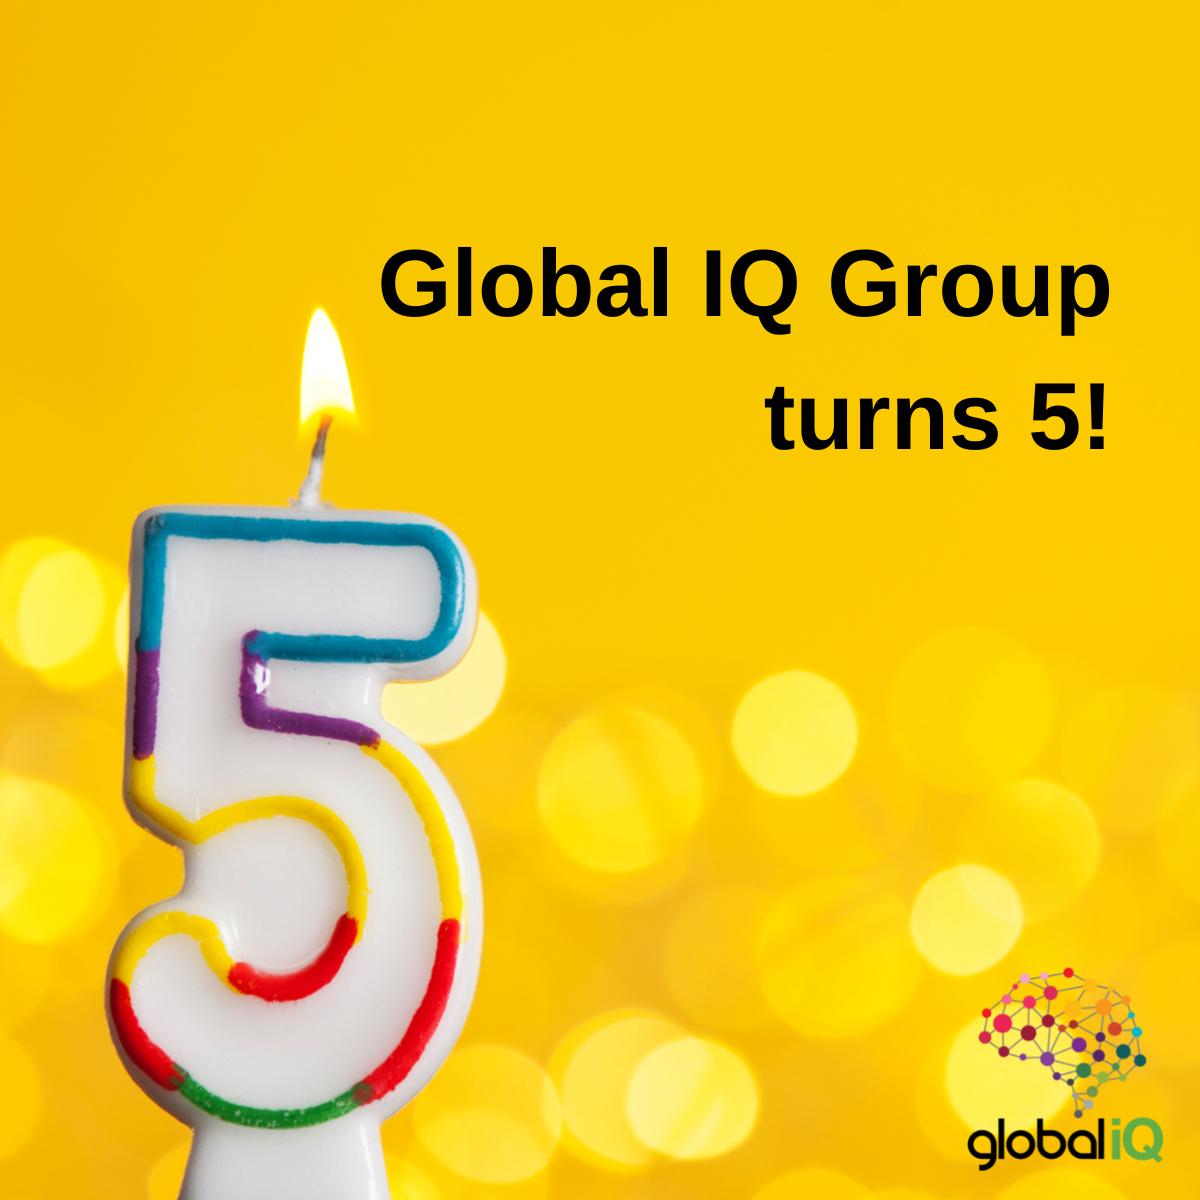 Global IQ Group celebrates 5th birthday!